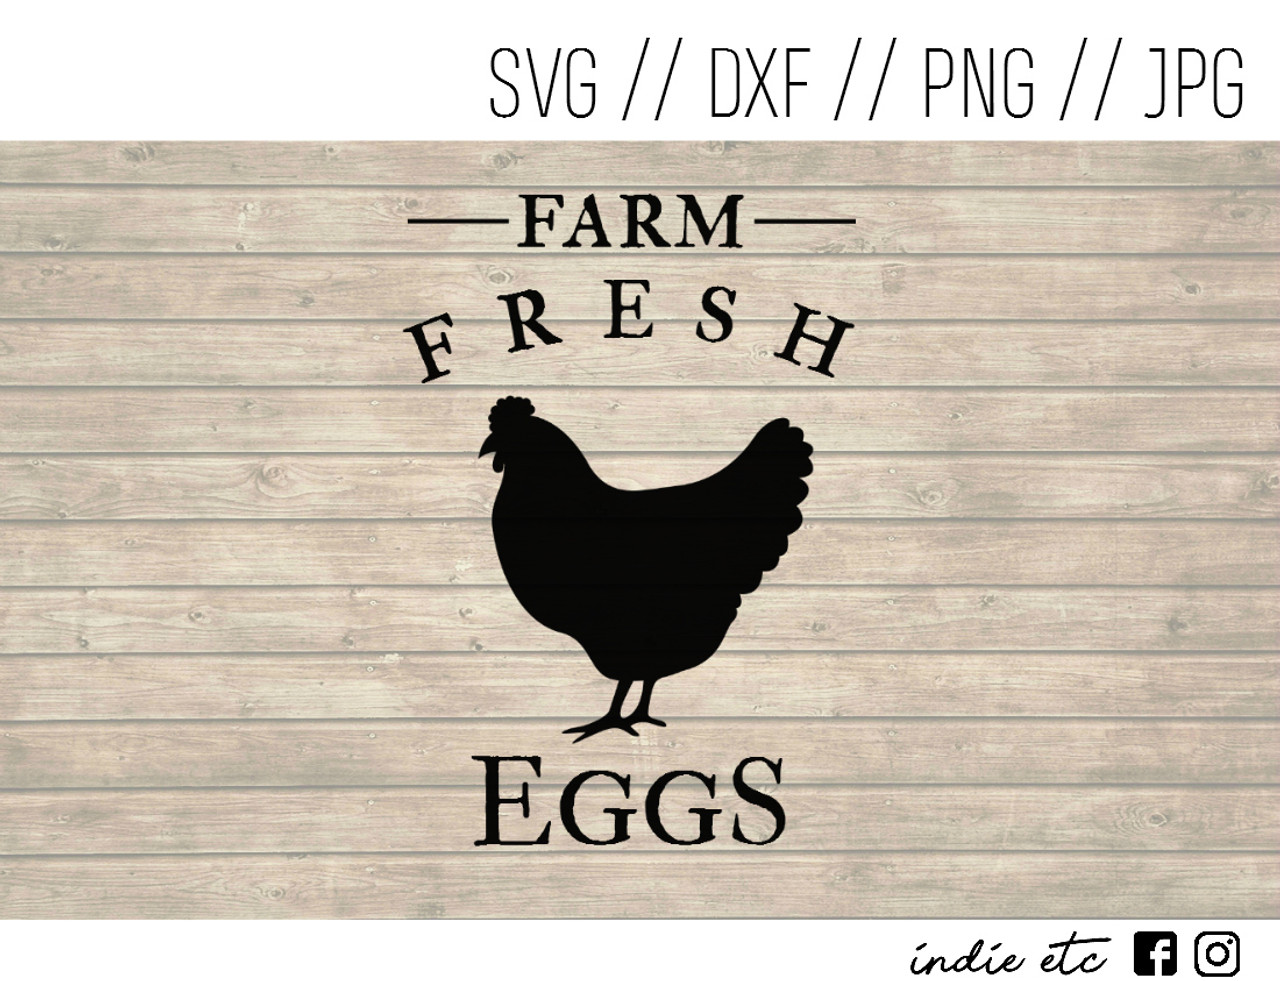 Farm Fresh Eggs Digital Art File Svg Dxf Png Jpeg